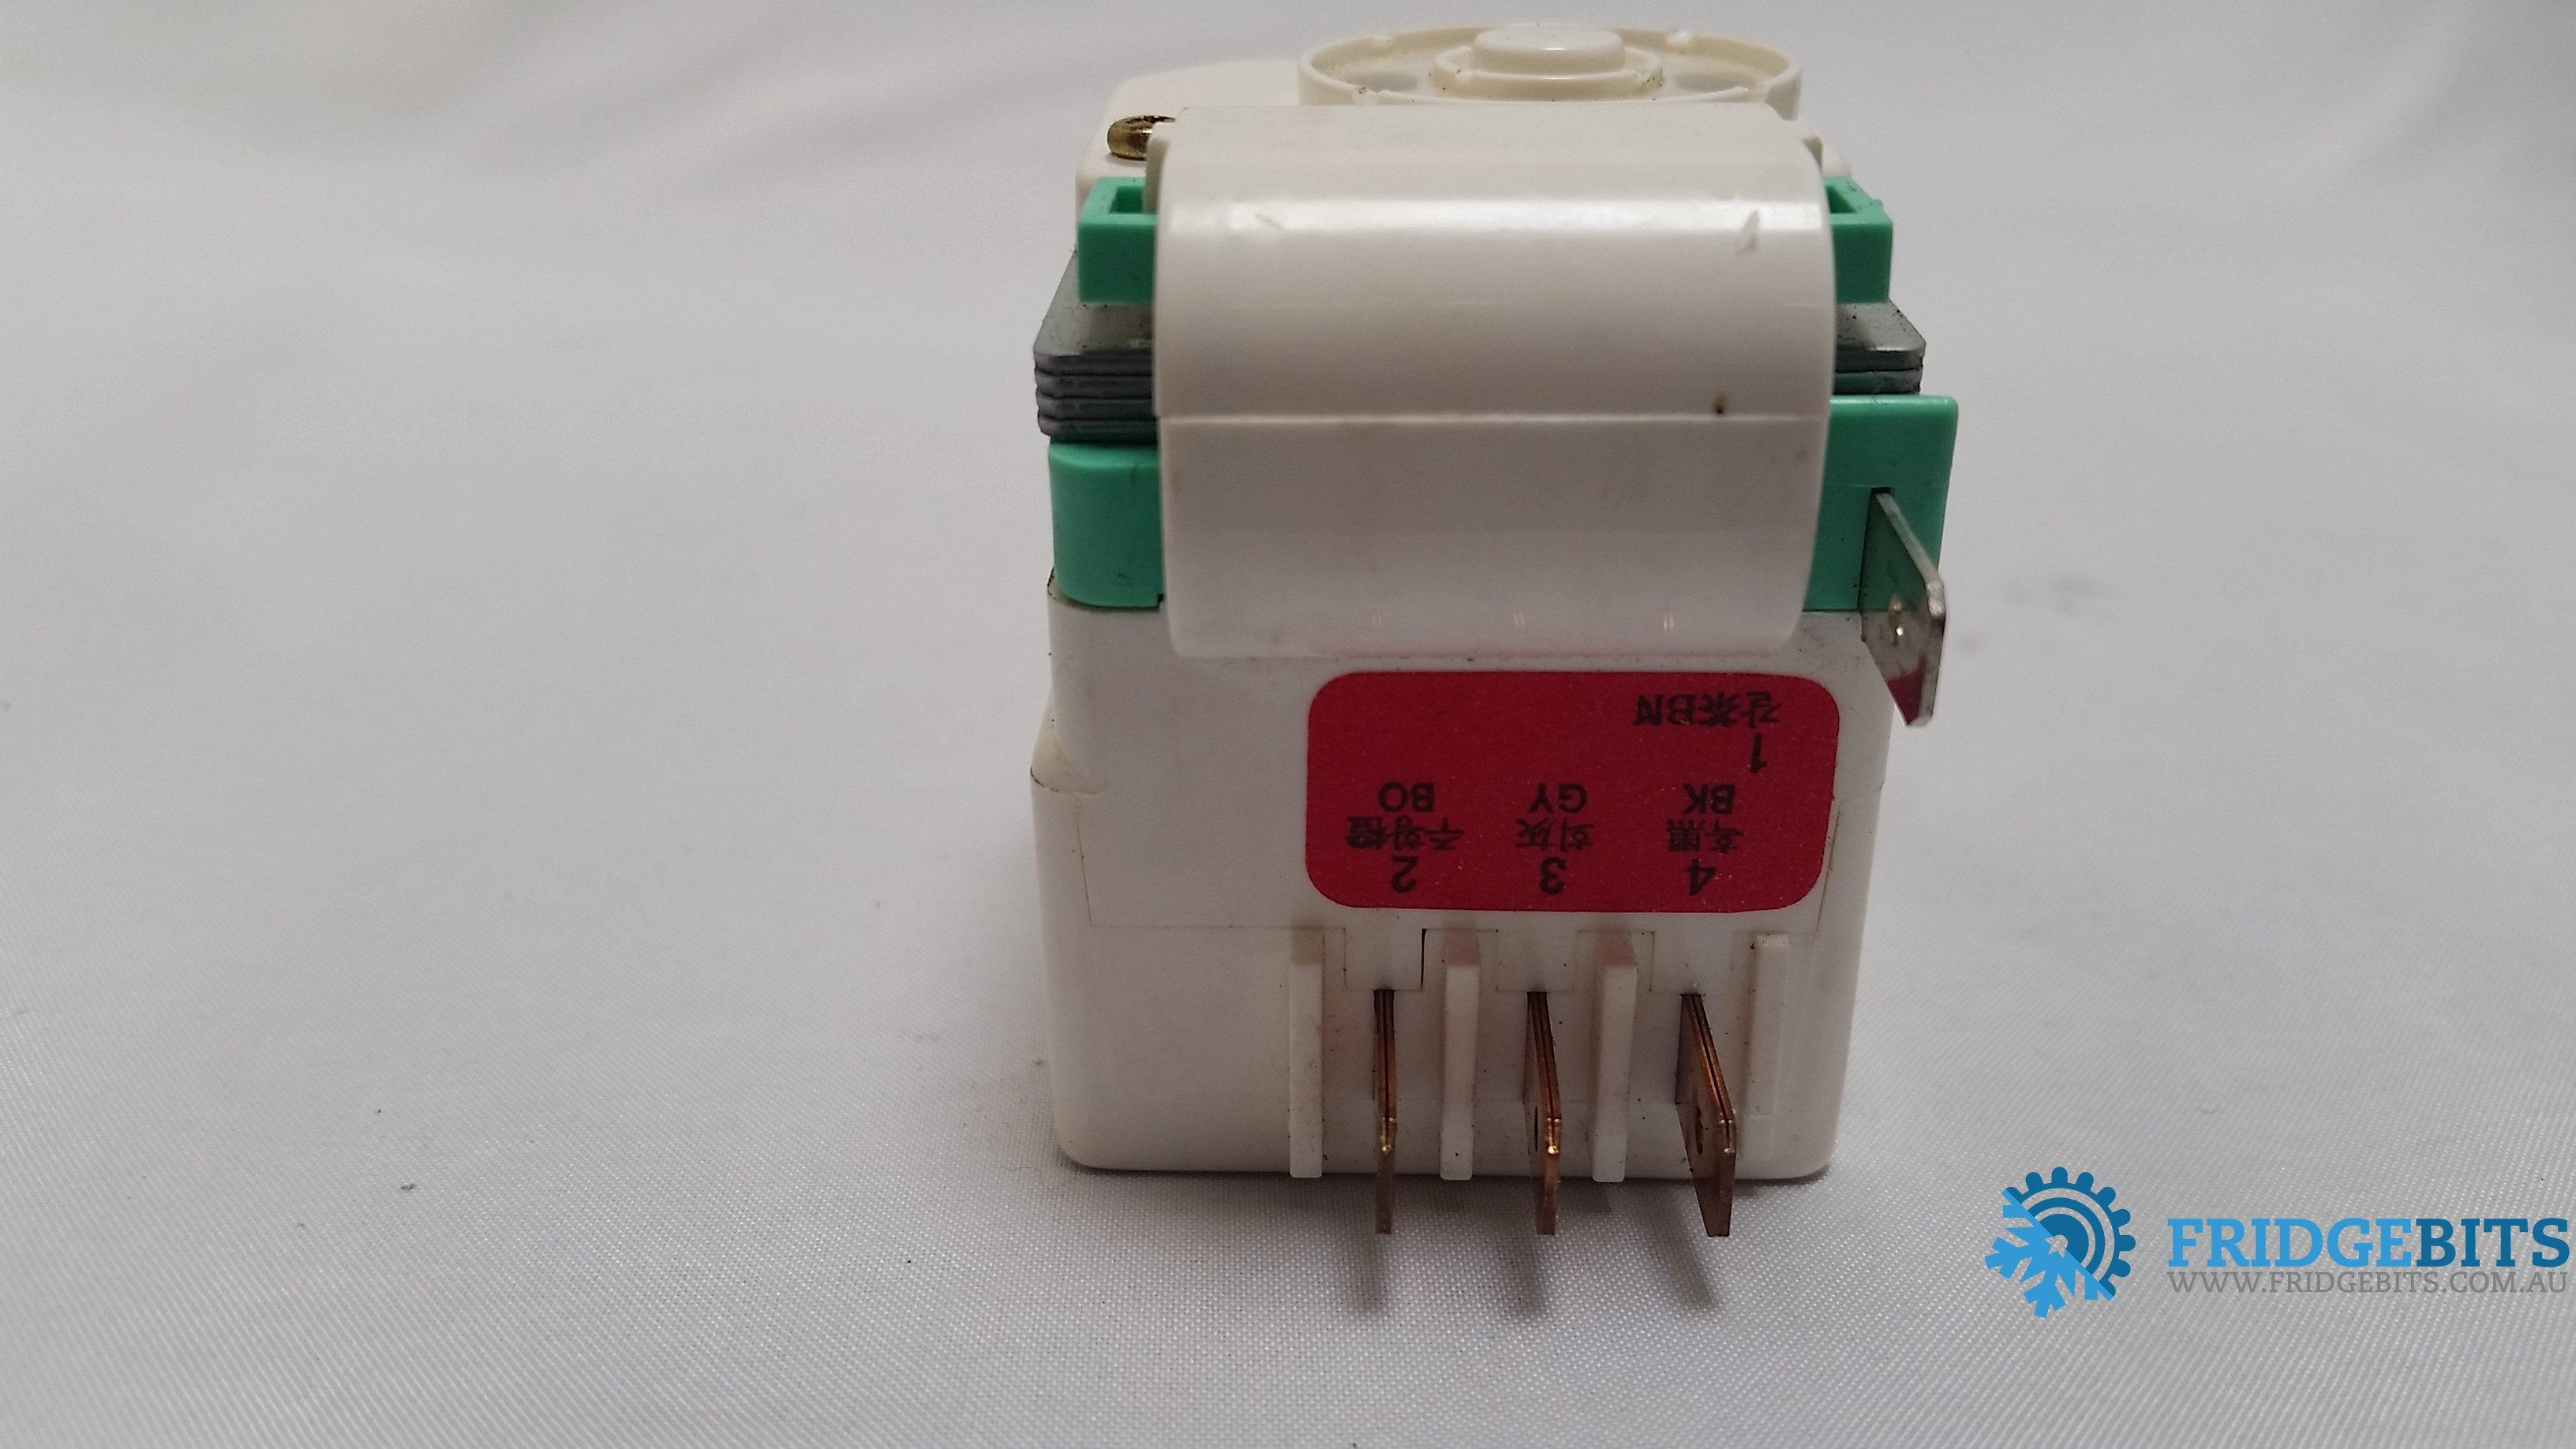 Sankyo Tmde706sc 200 240v 50 60hz 6 Hour 35 Minute Defrost Timer Circuit Diagram